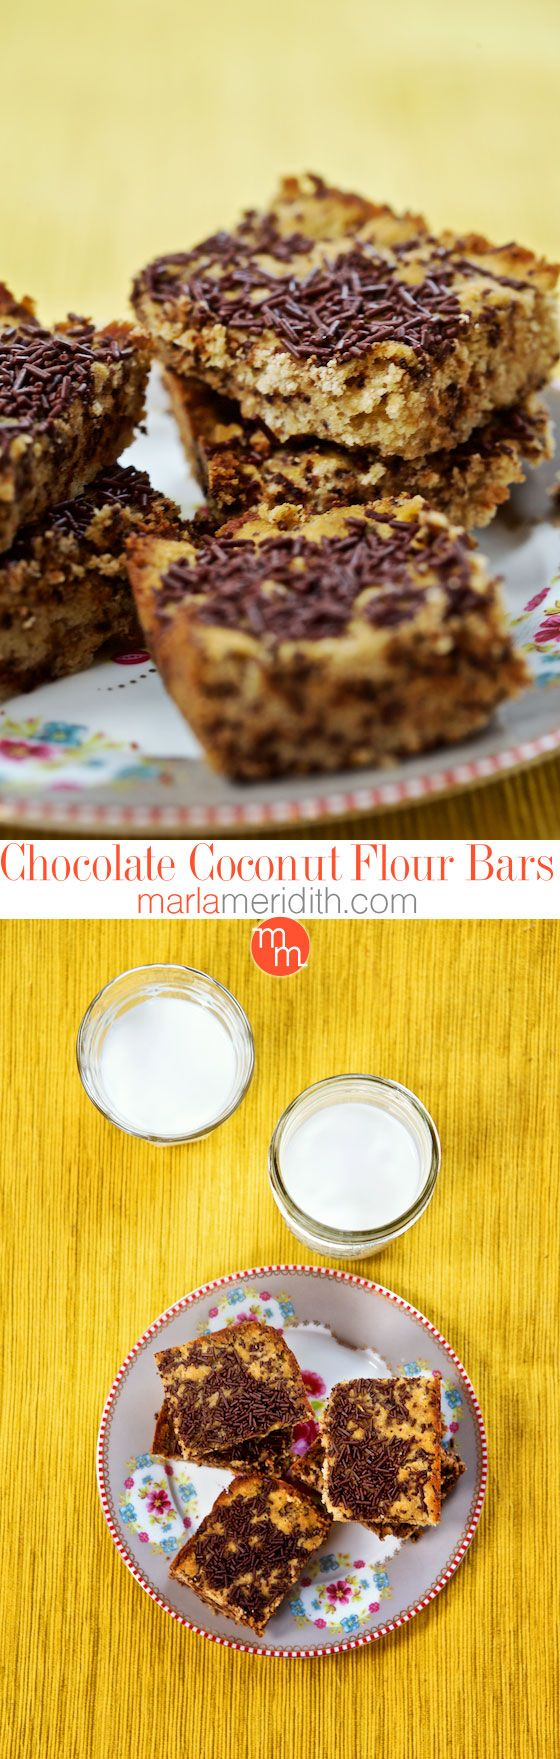 Gluten Free Chocolate Coconut Flour Bars   https://MarlaMeridith.com  Marla Meridith  More Gluten Free Chocolate, Bar Recipe